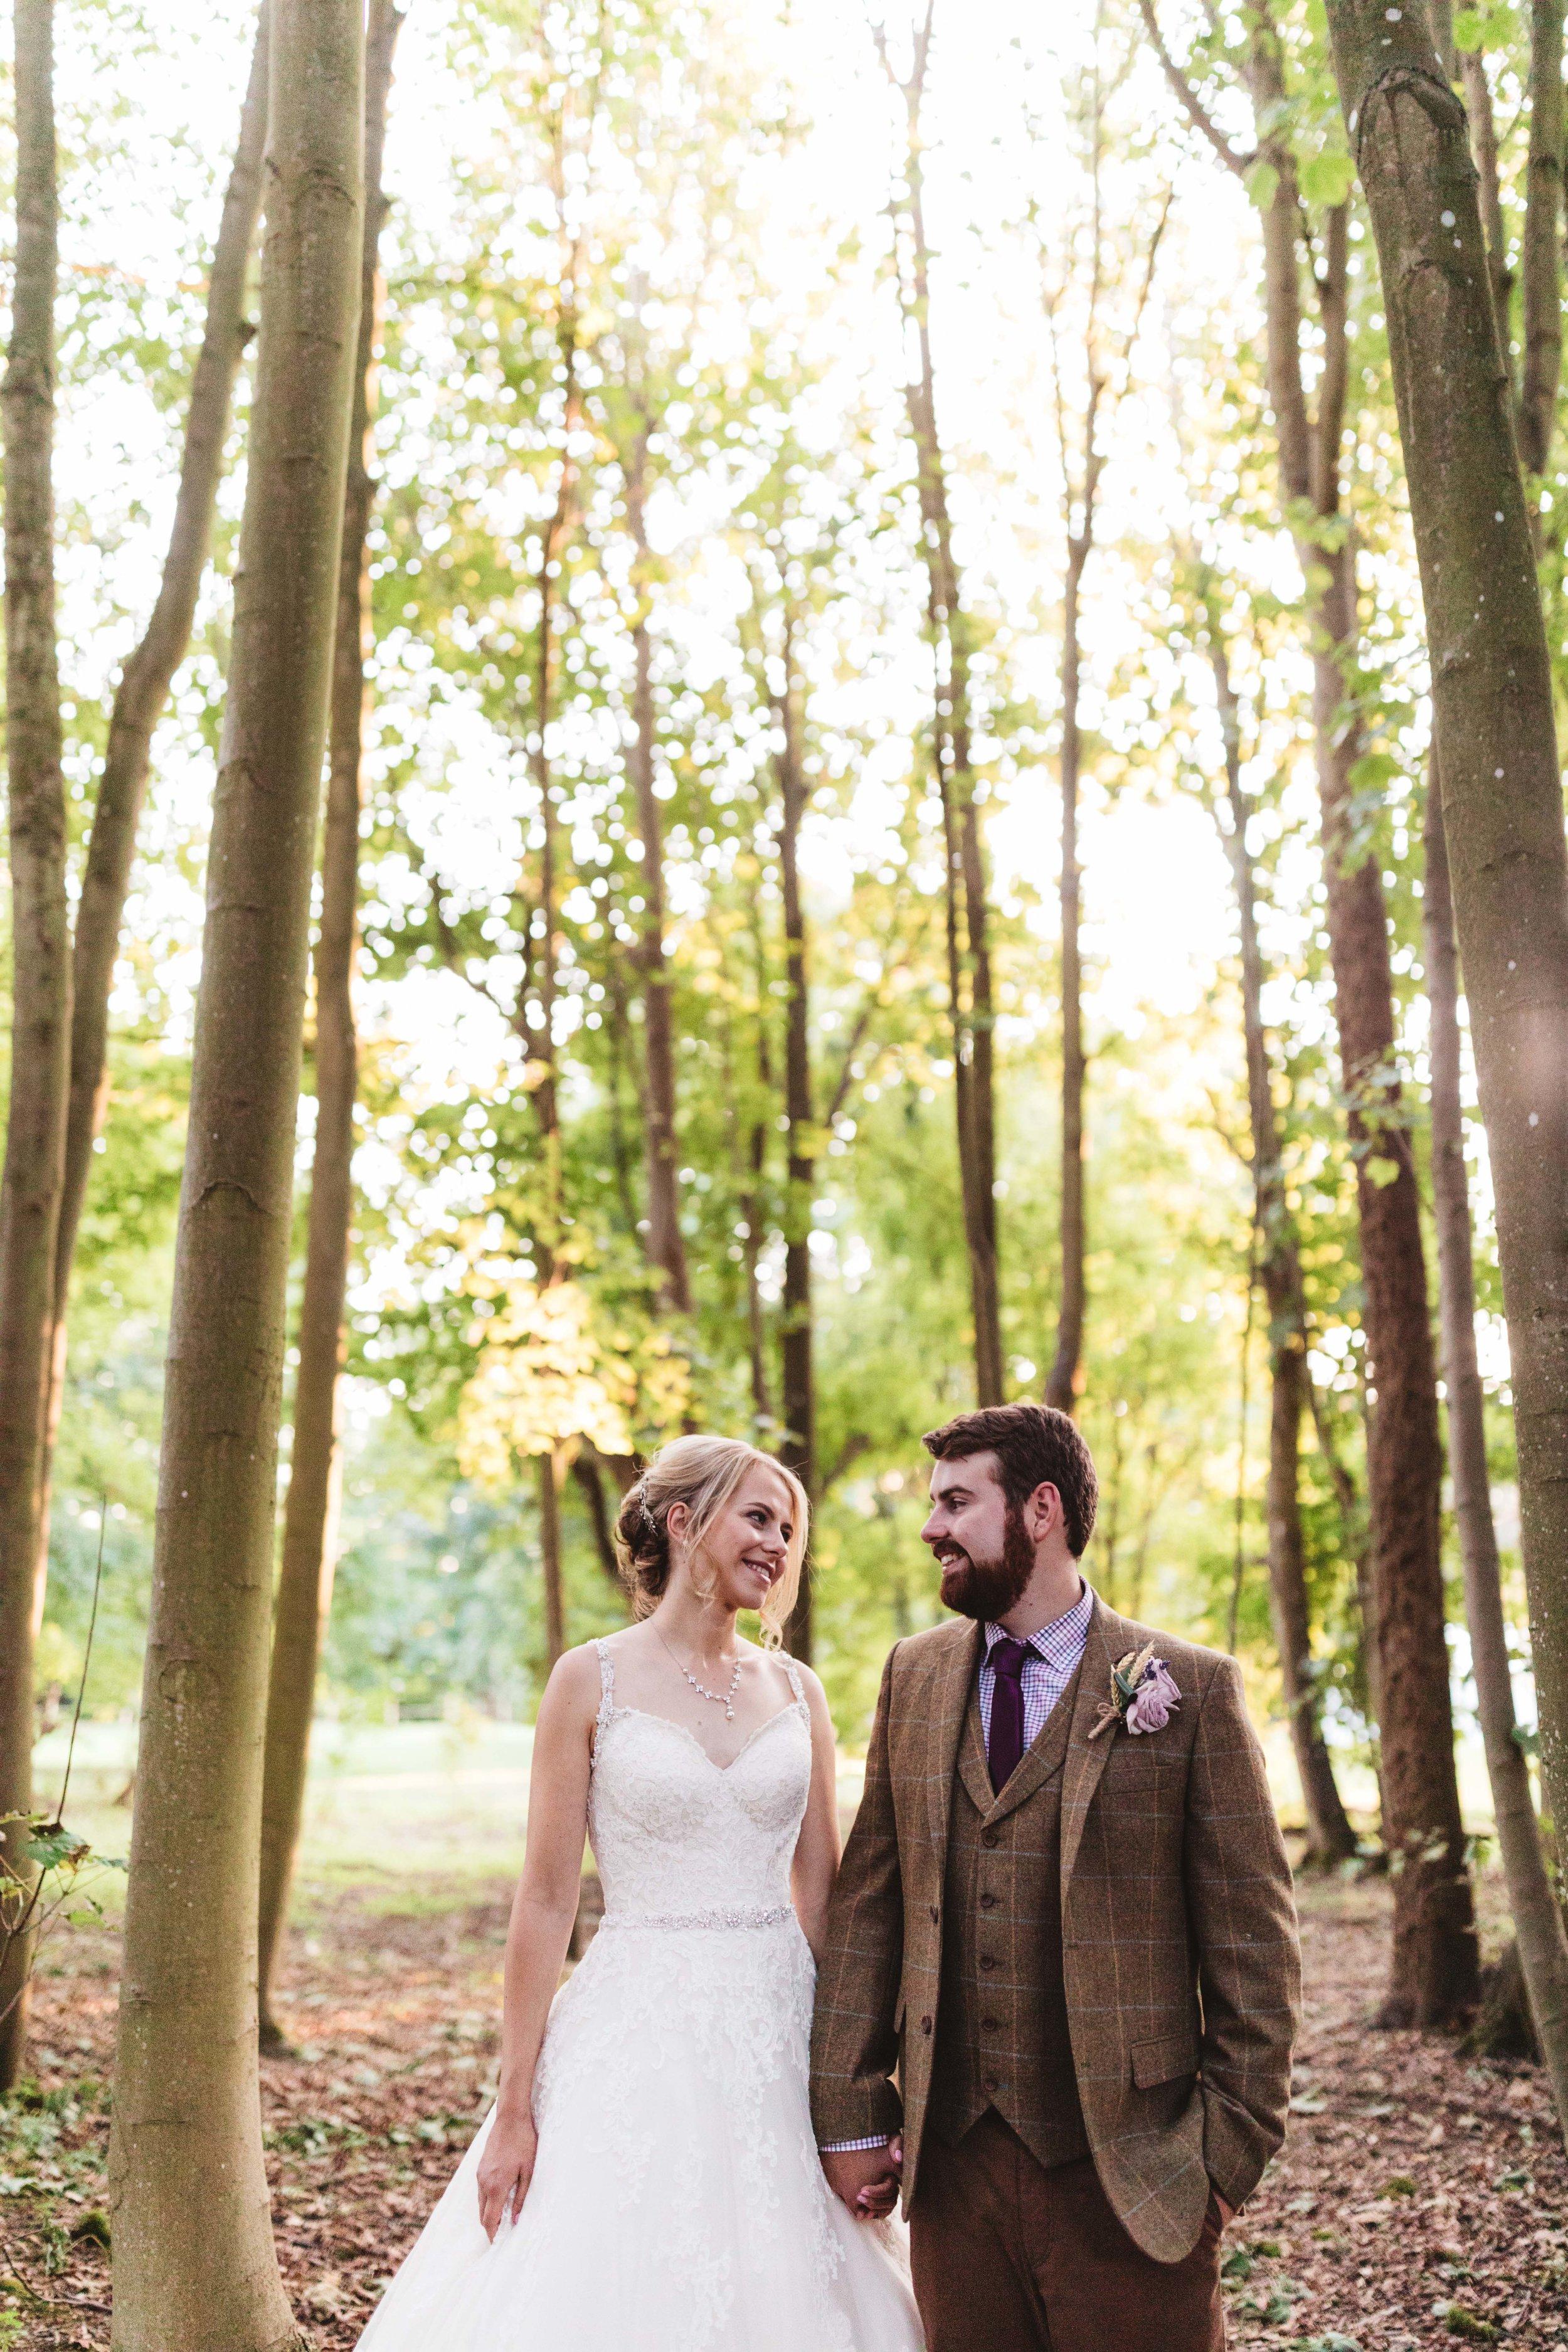 Jo & Sam Birling Woods Kent Wedding Photography-93.jpg